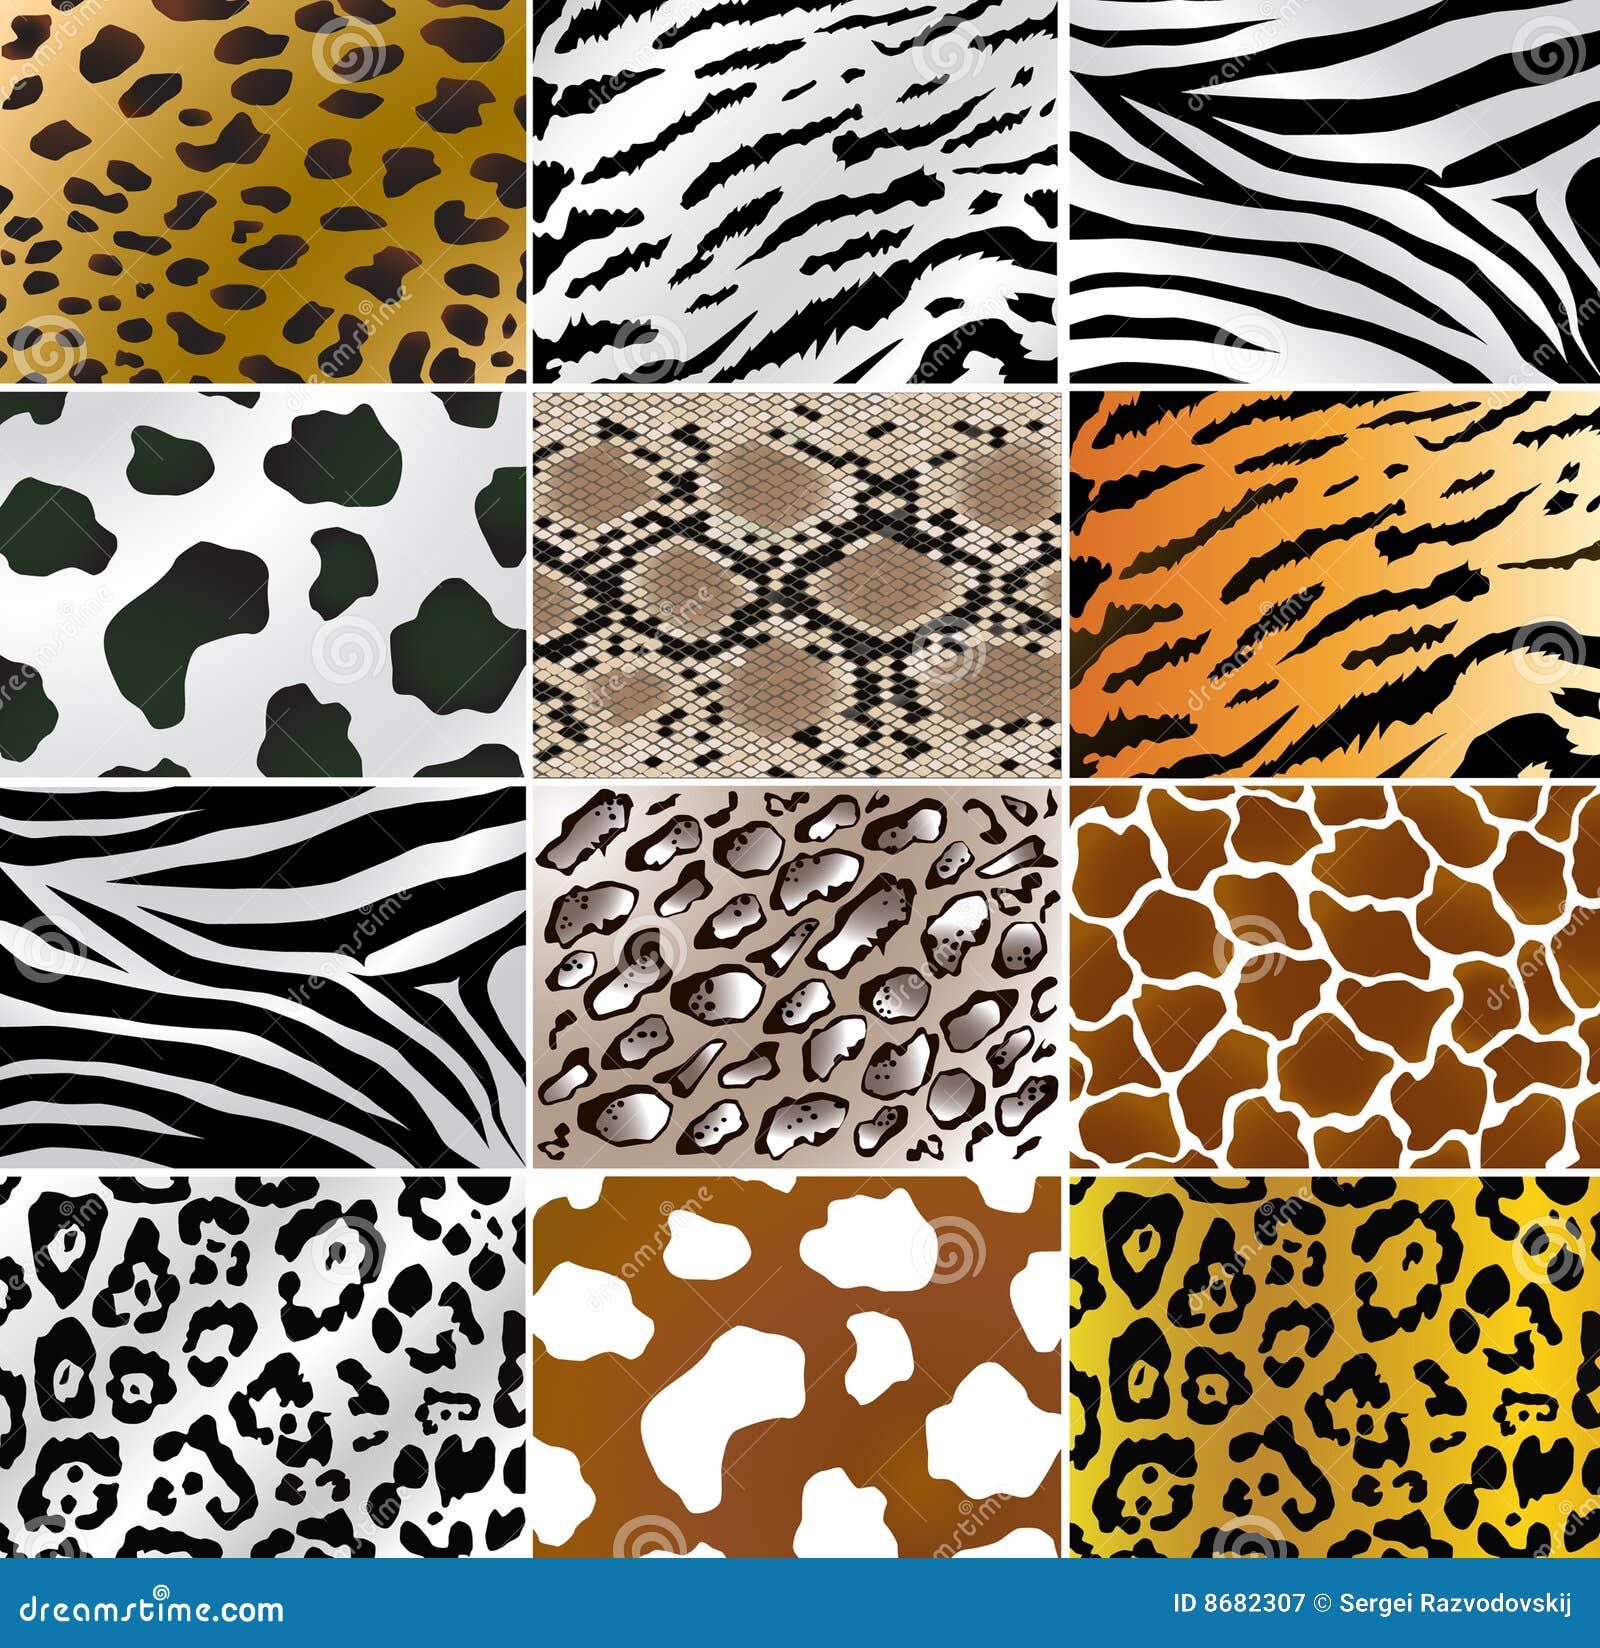 Draw House Plan Animal Skins Royalty Free Stock Photography Image 8682307